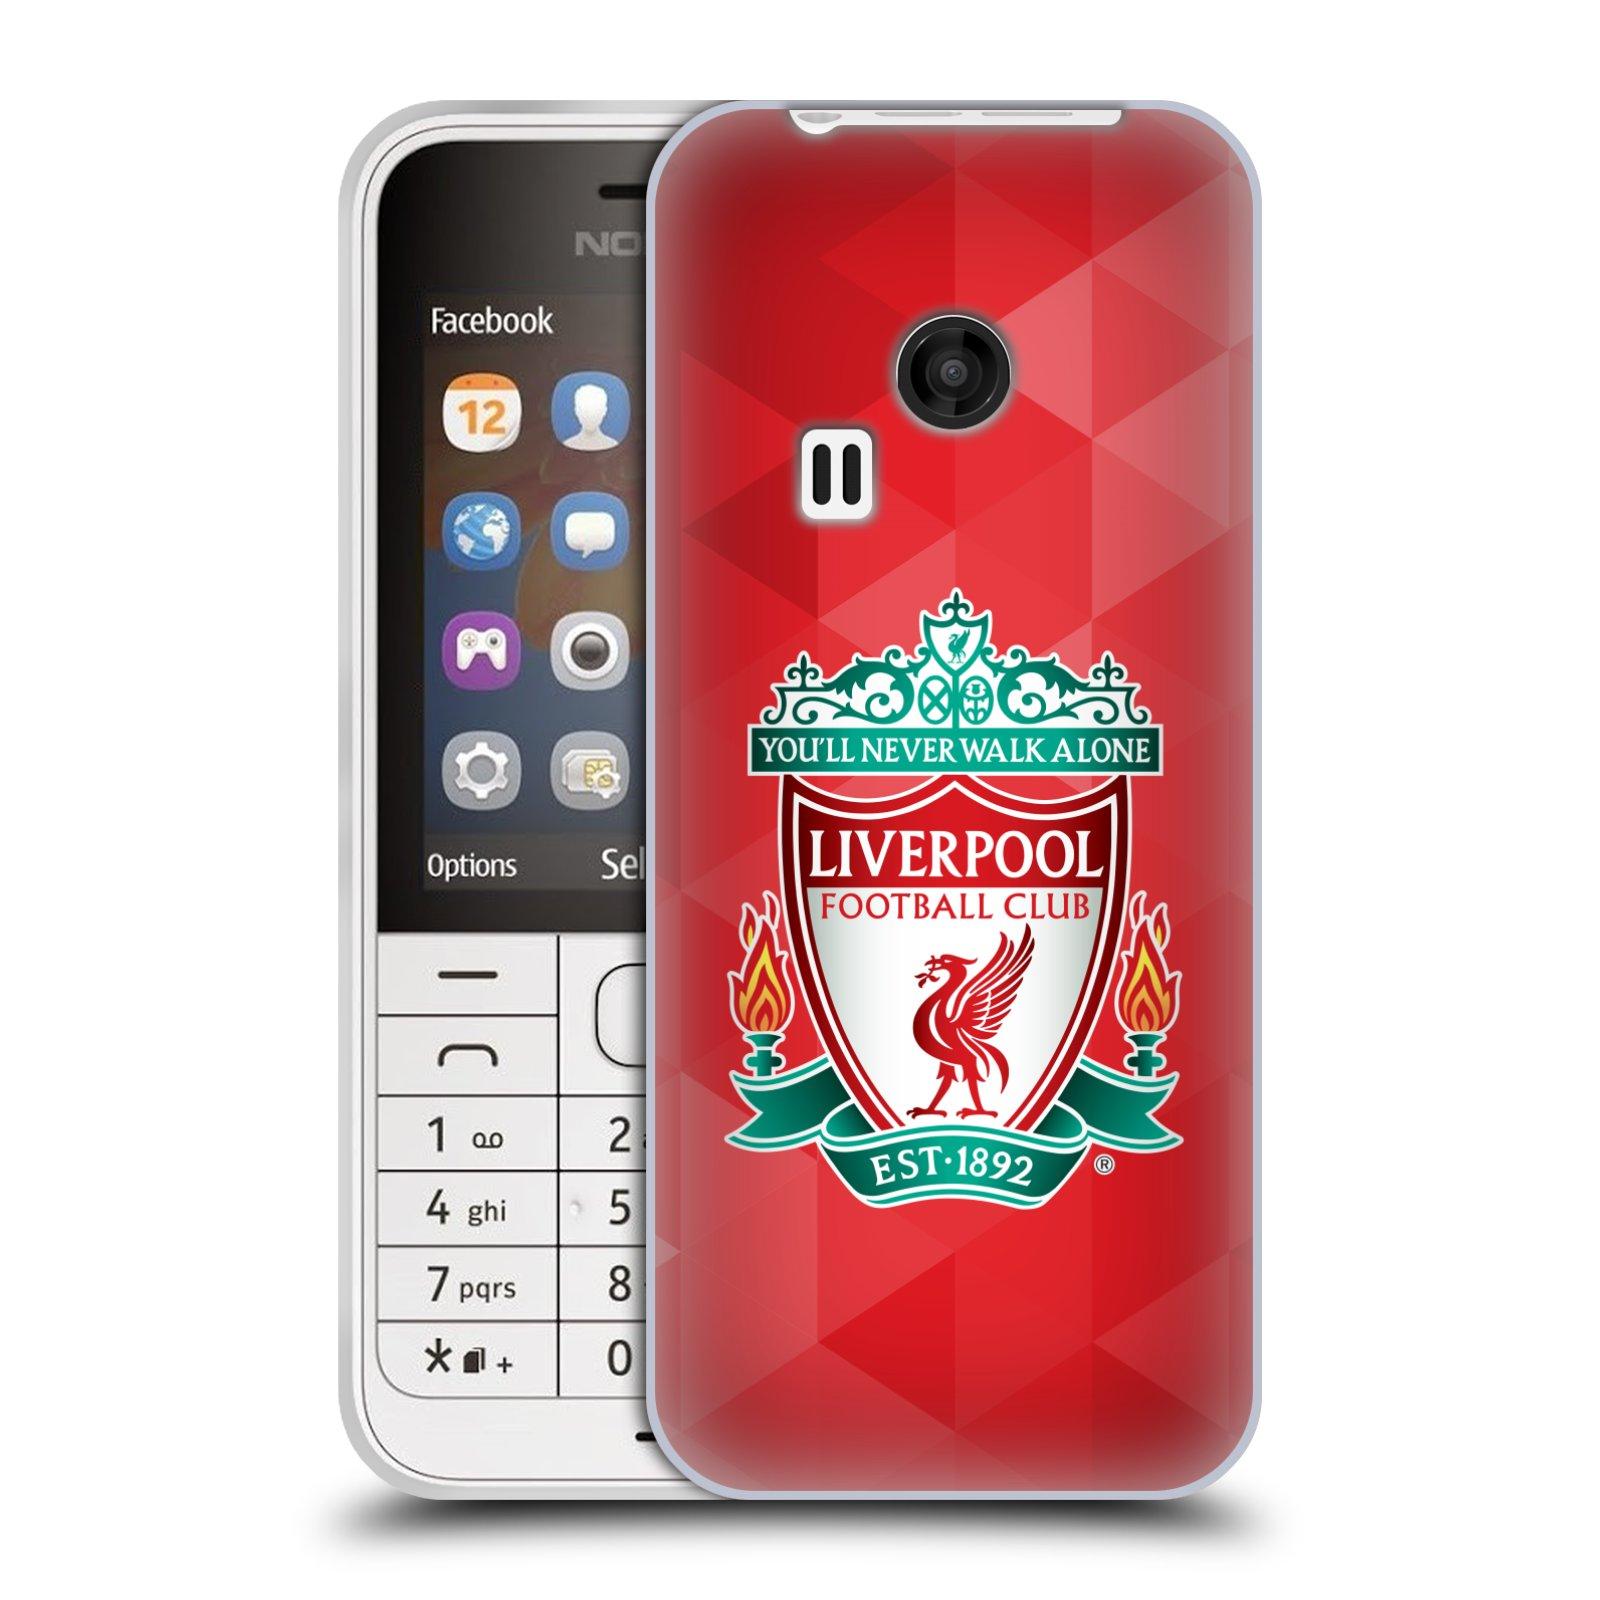 Silikonové pouzdro na mobil Nokia 220 HEAD CASE ZNAK LIVERPOOL FC OFFICIAL GEOMETRIC RED (Silikonový kryt či obal na mobilní telefon Liverpool FC Official pro Nokia 220 a 220 Dual SIM)